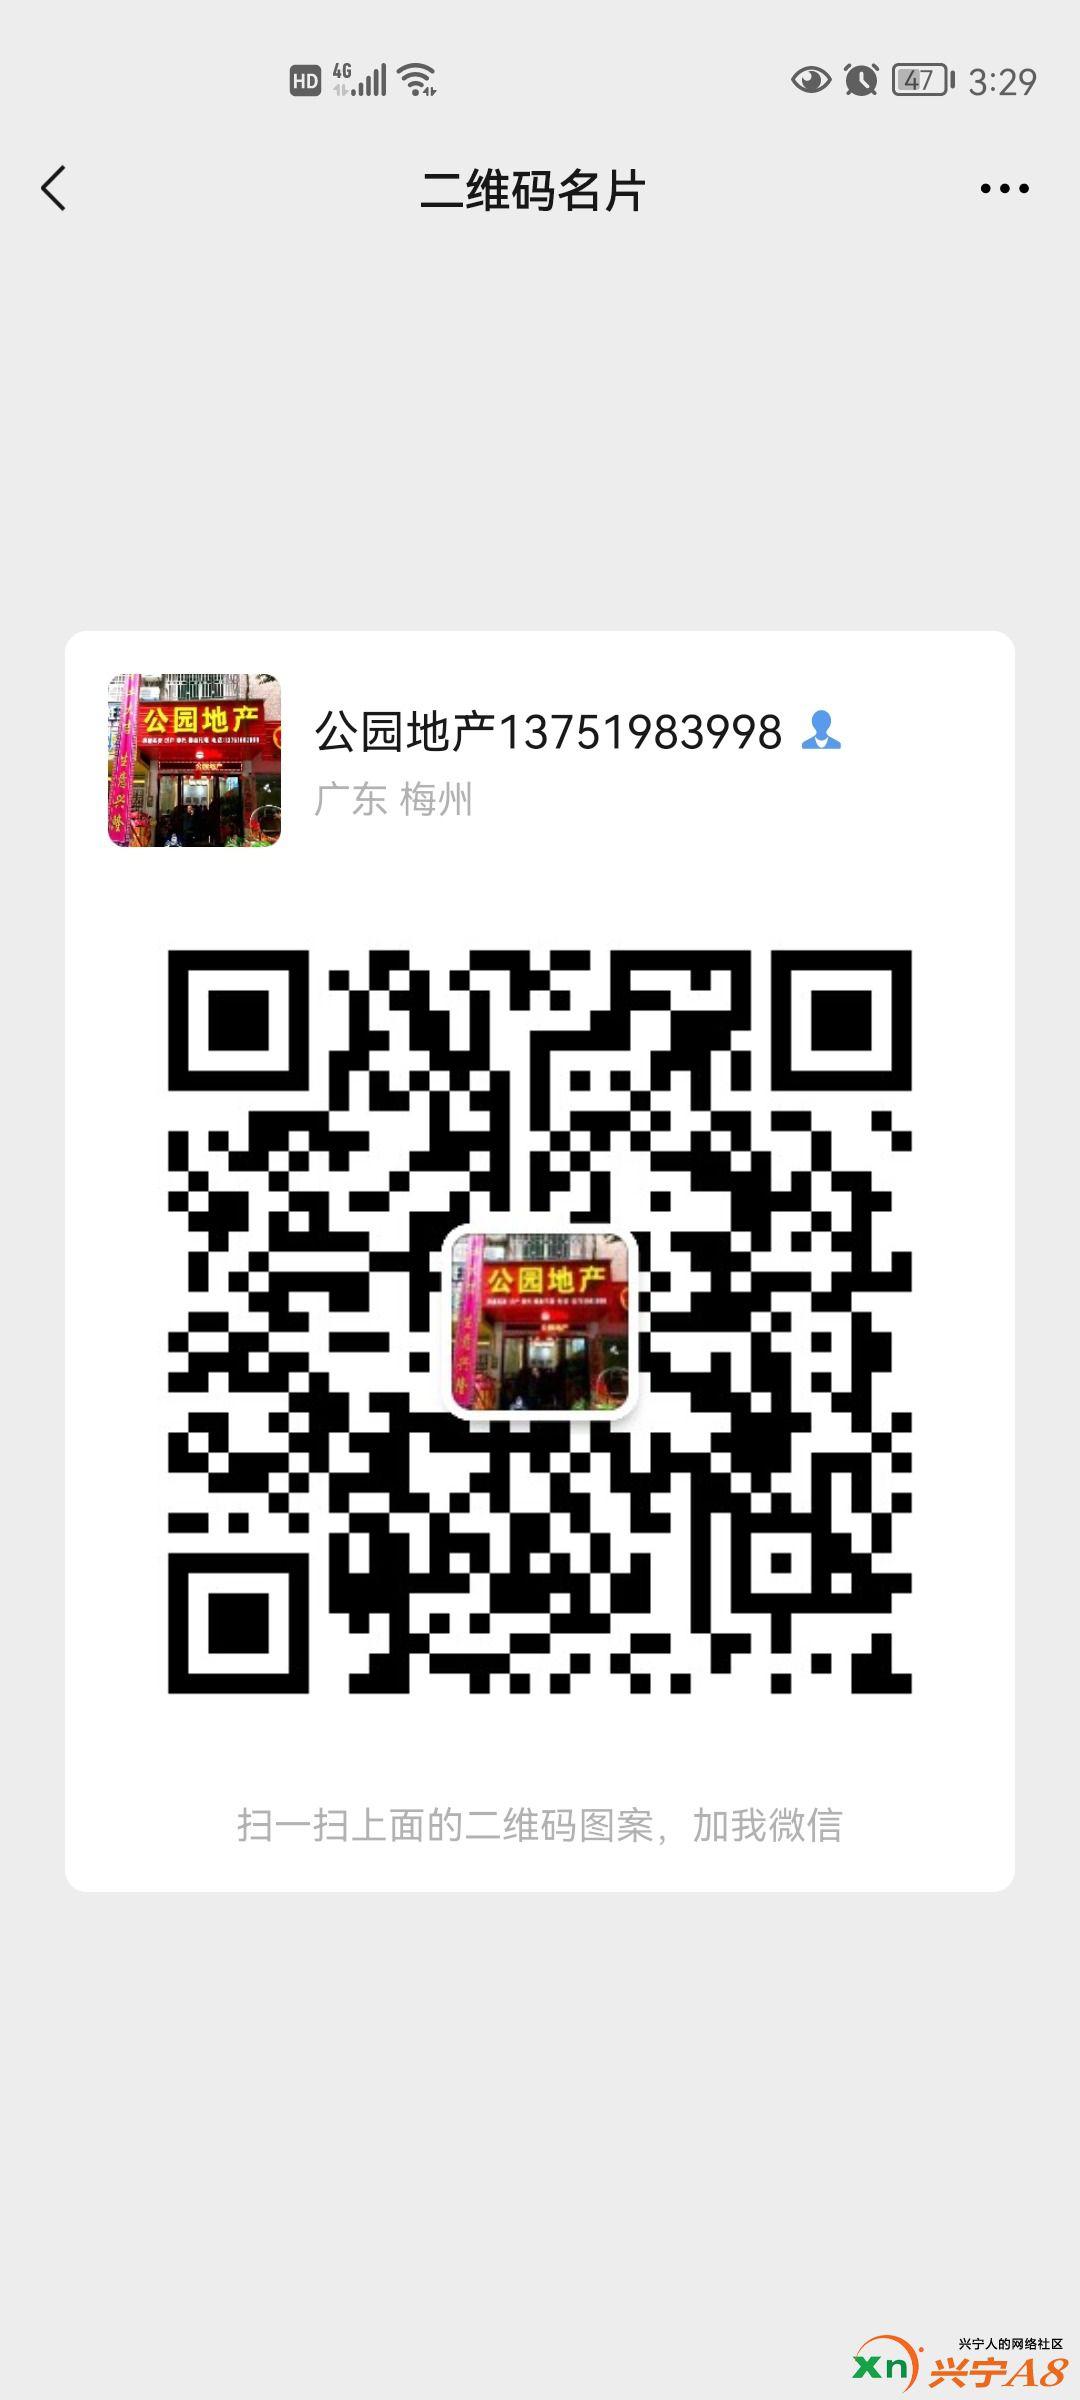 Screenshot_20210910_152940_com.tencent.mm.jpg